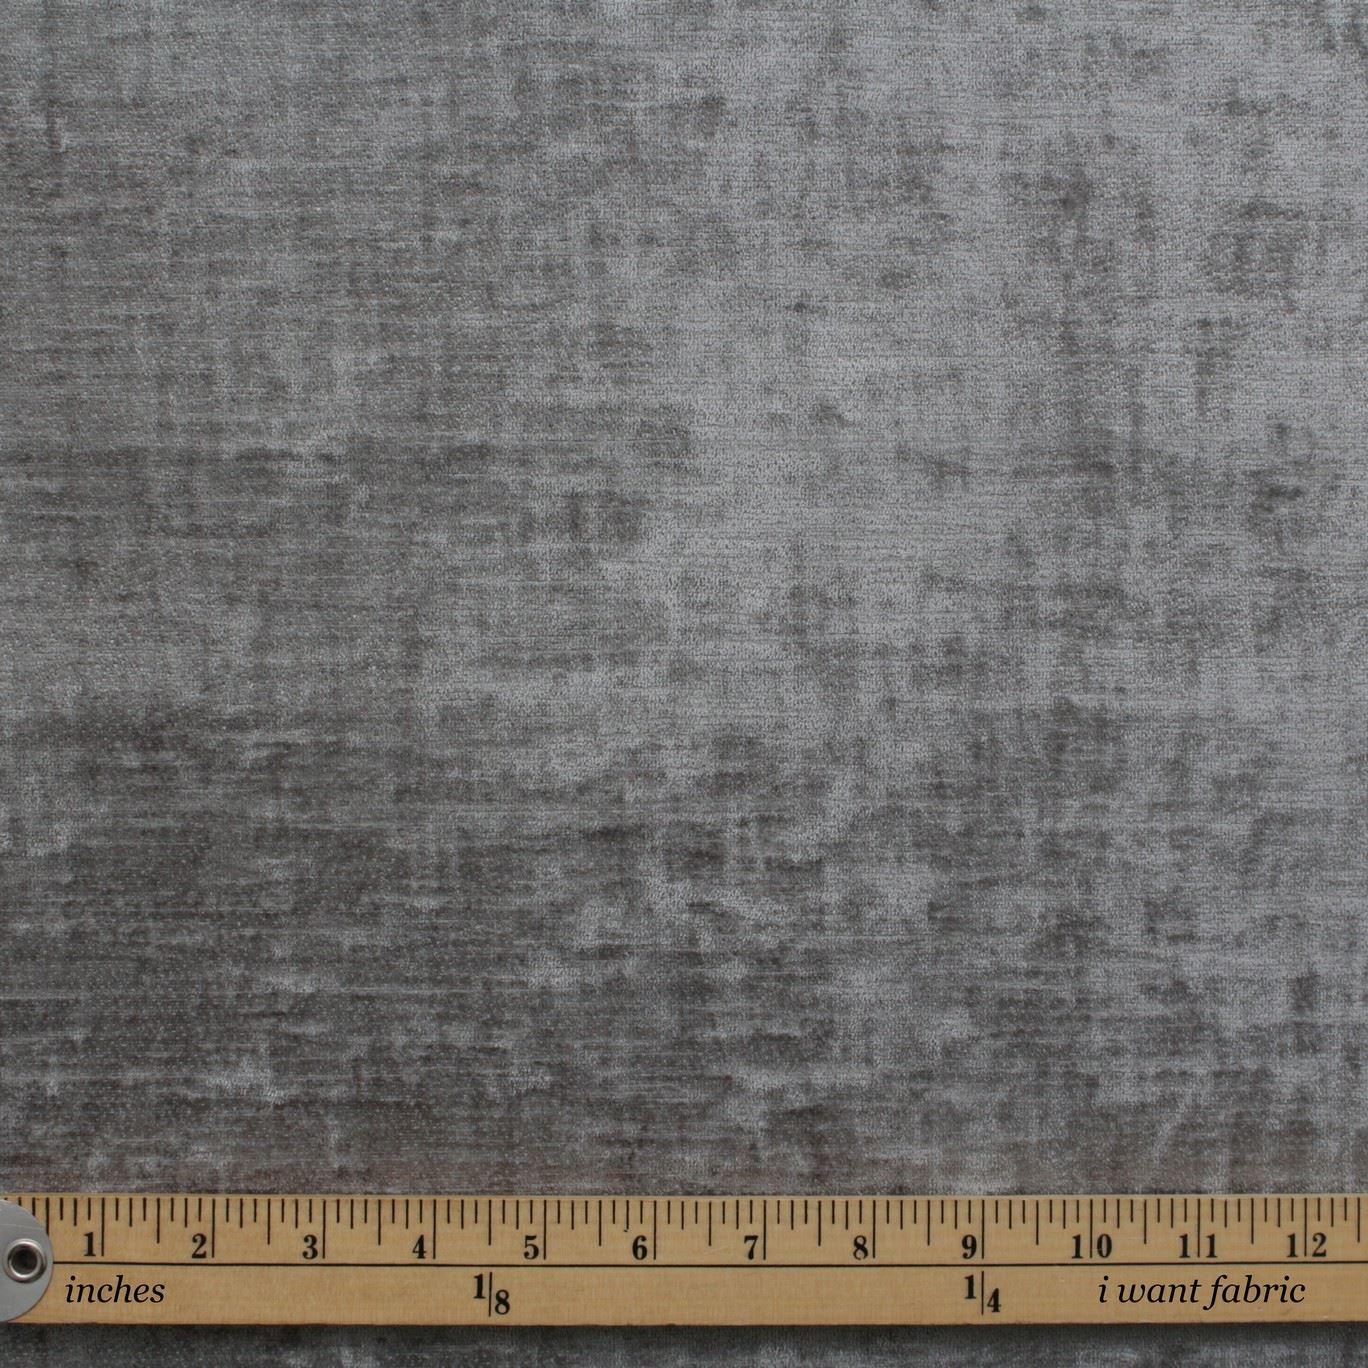 thumbnail 44 - LUXURY PLUSH CRUSHED SATIN VELVET SUPER SOFT HEAVY WEIGHT UPHOLSTERY FABRIC